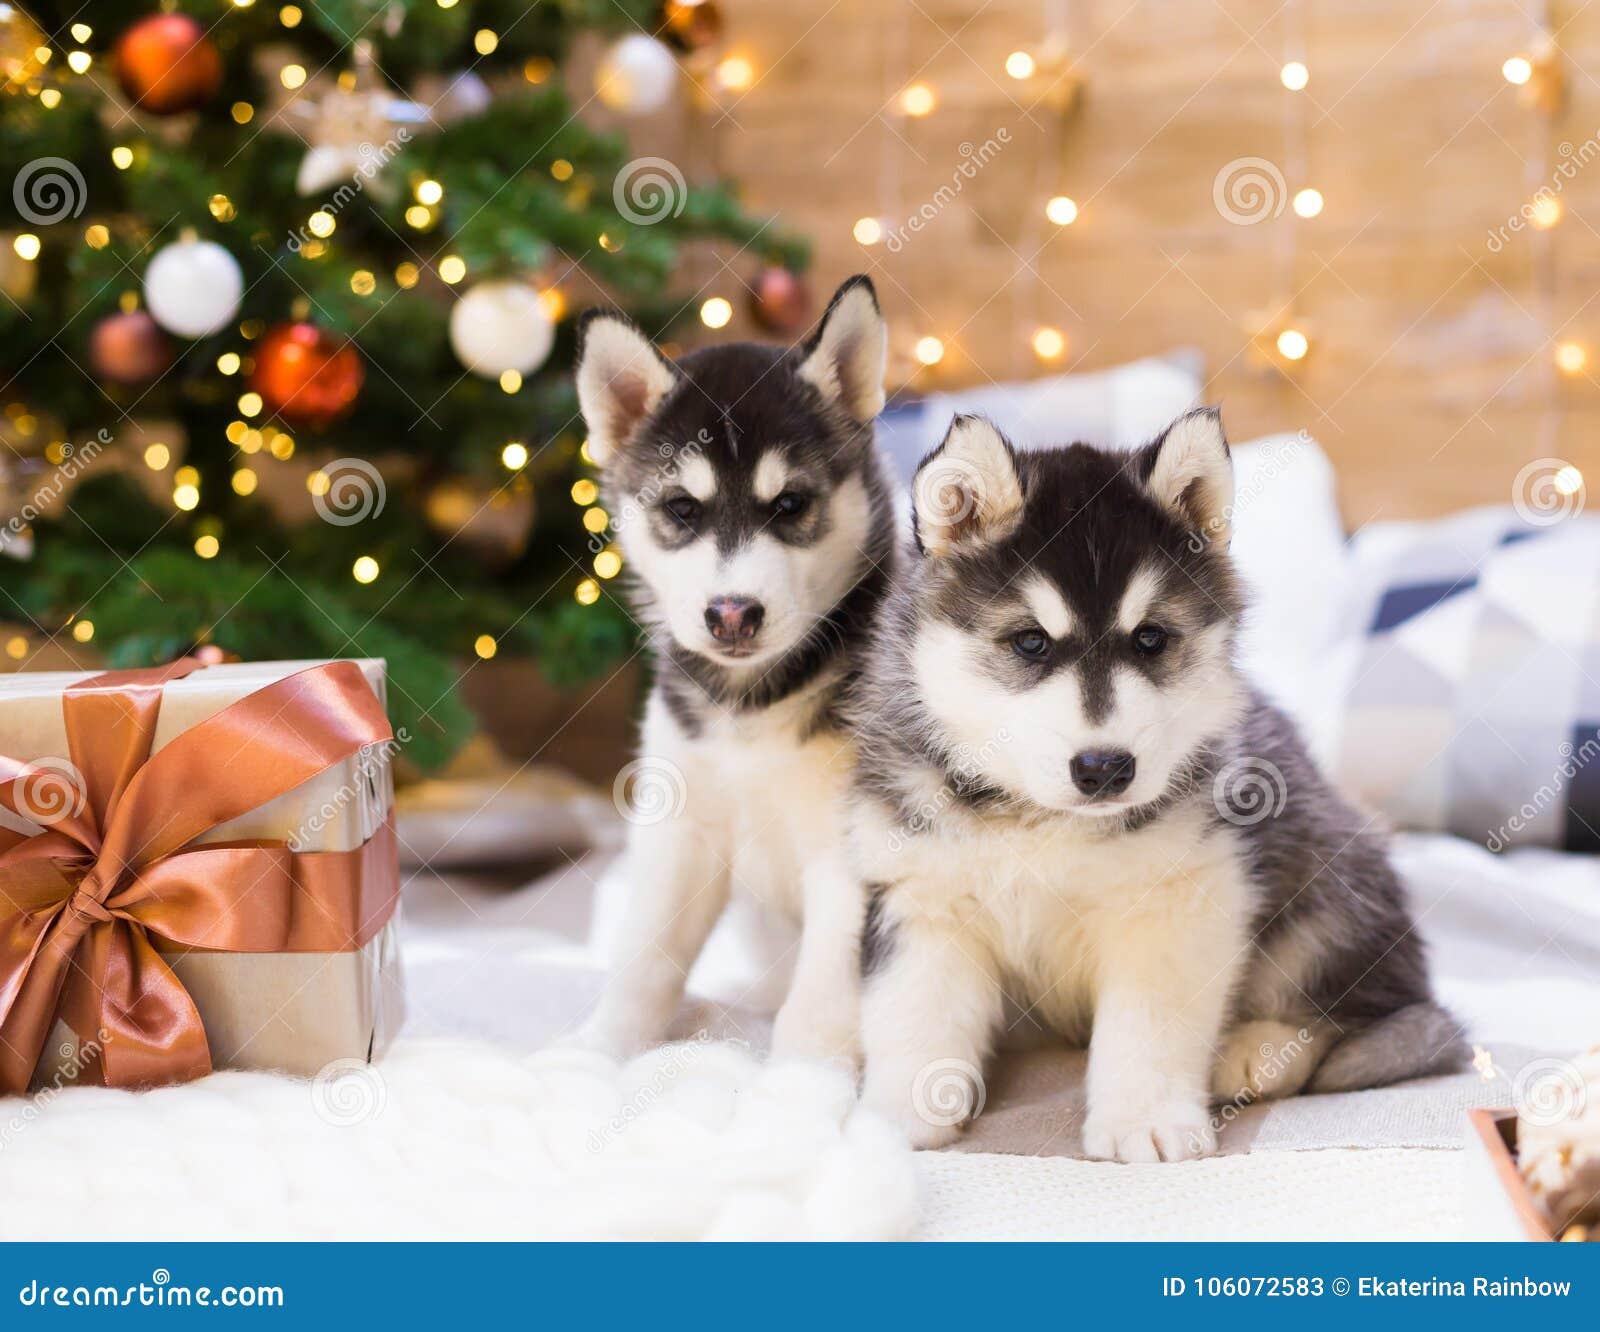 Husky Christmas Puppy.Animals Two Puppy Husky Gift Box Christmas Tree Close Up